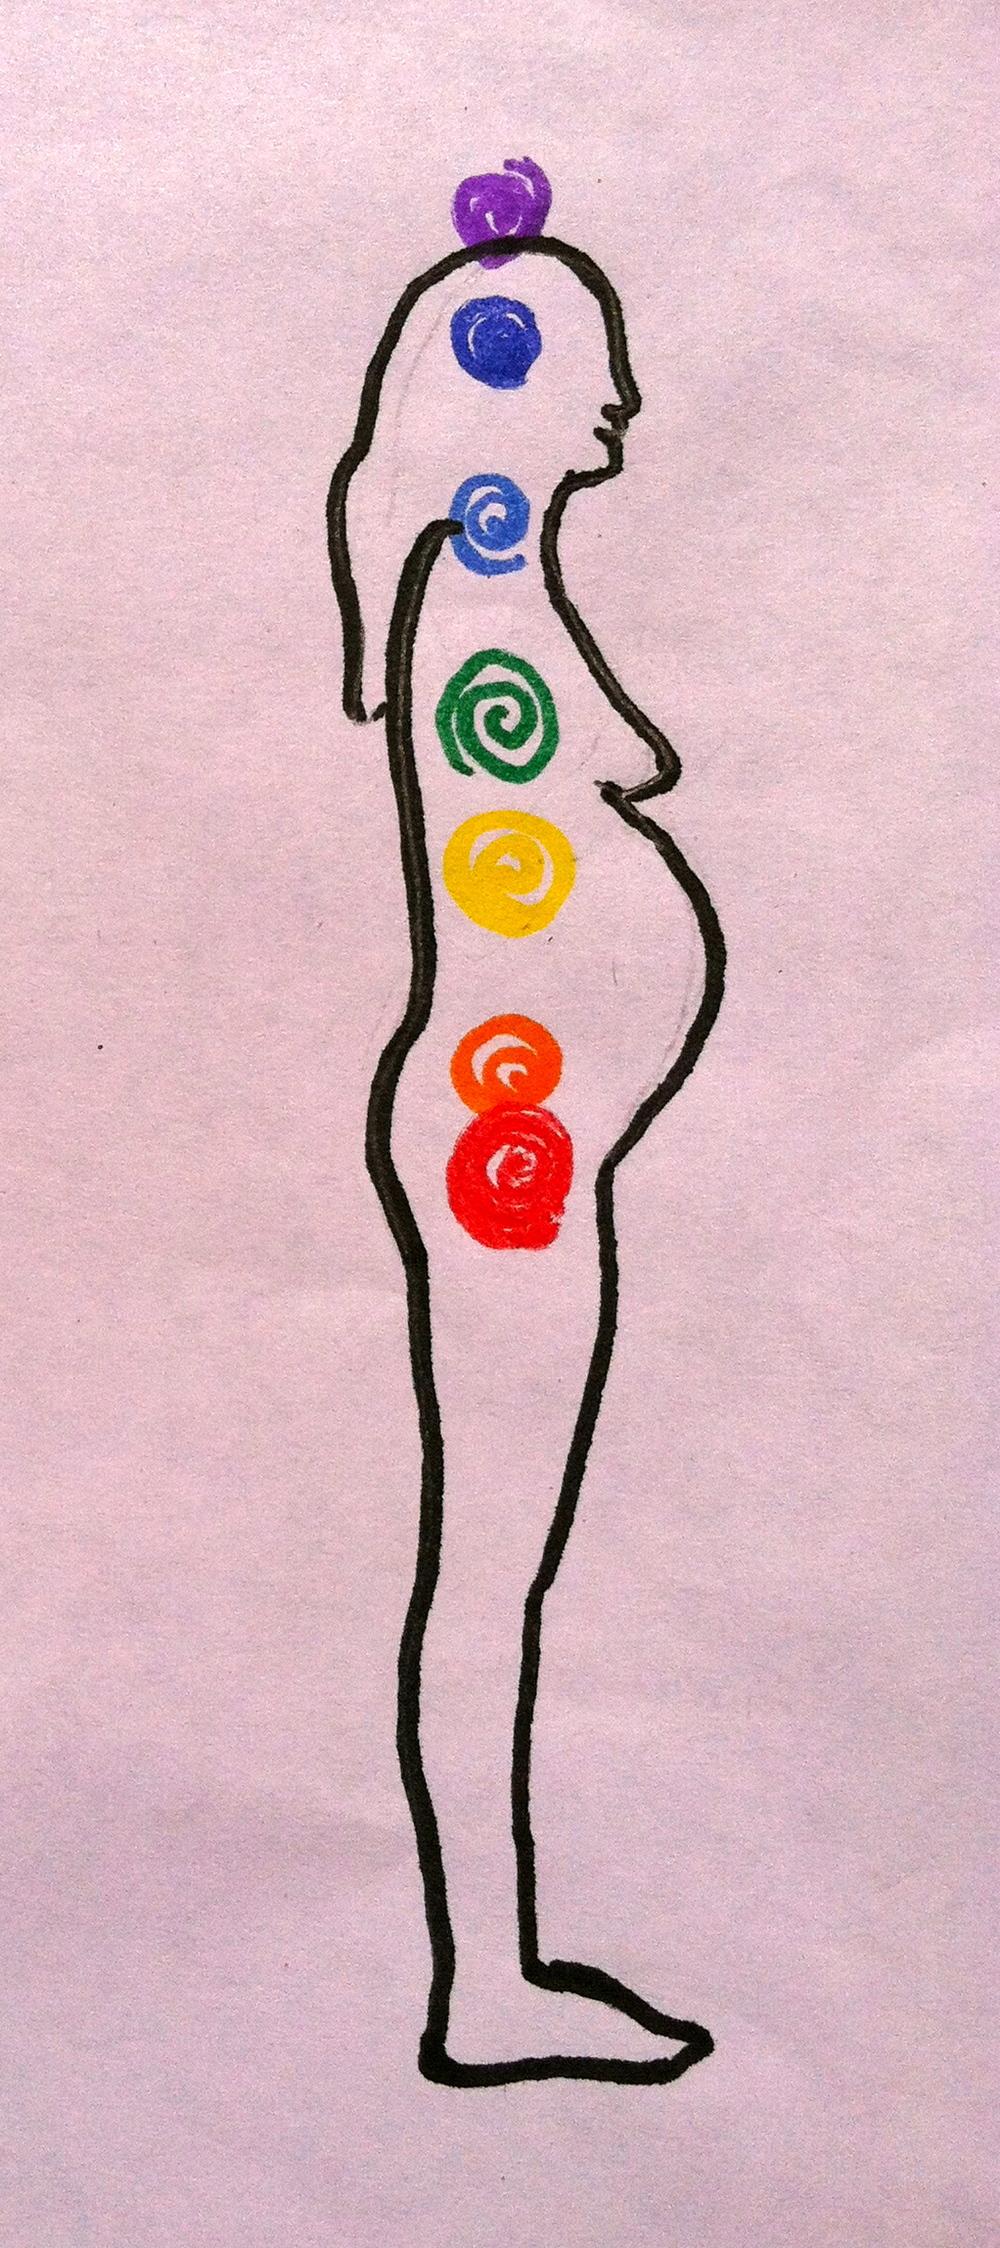 Perineum massage sex